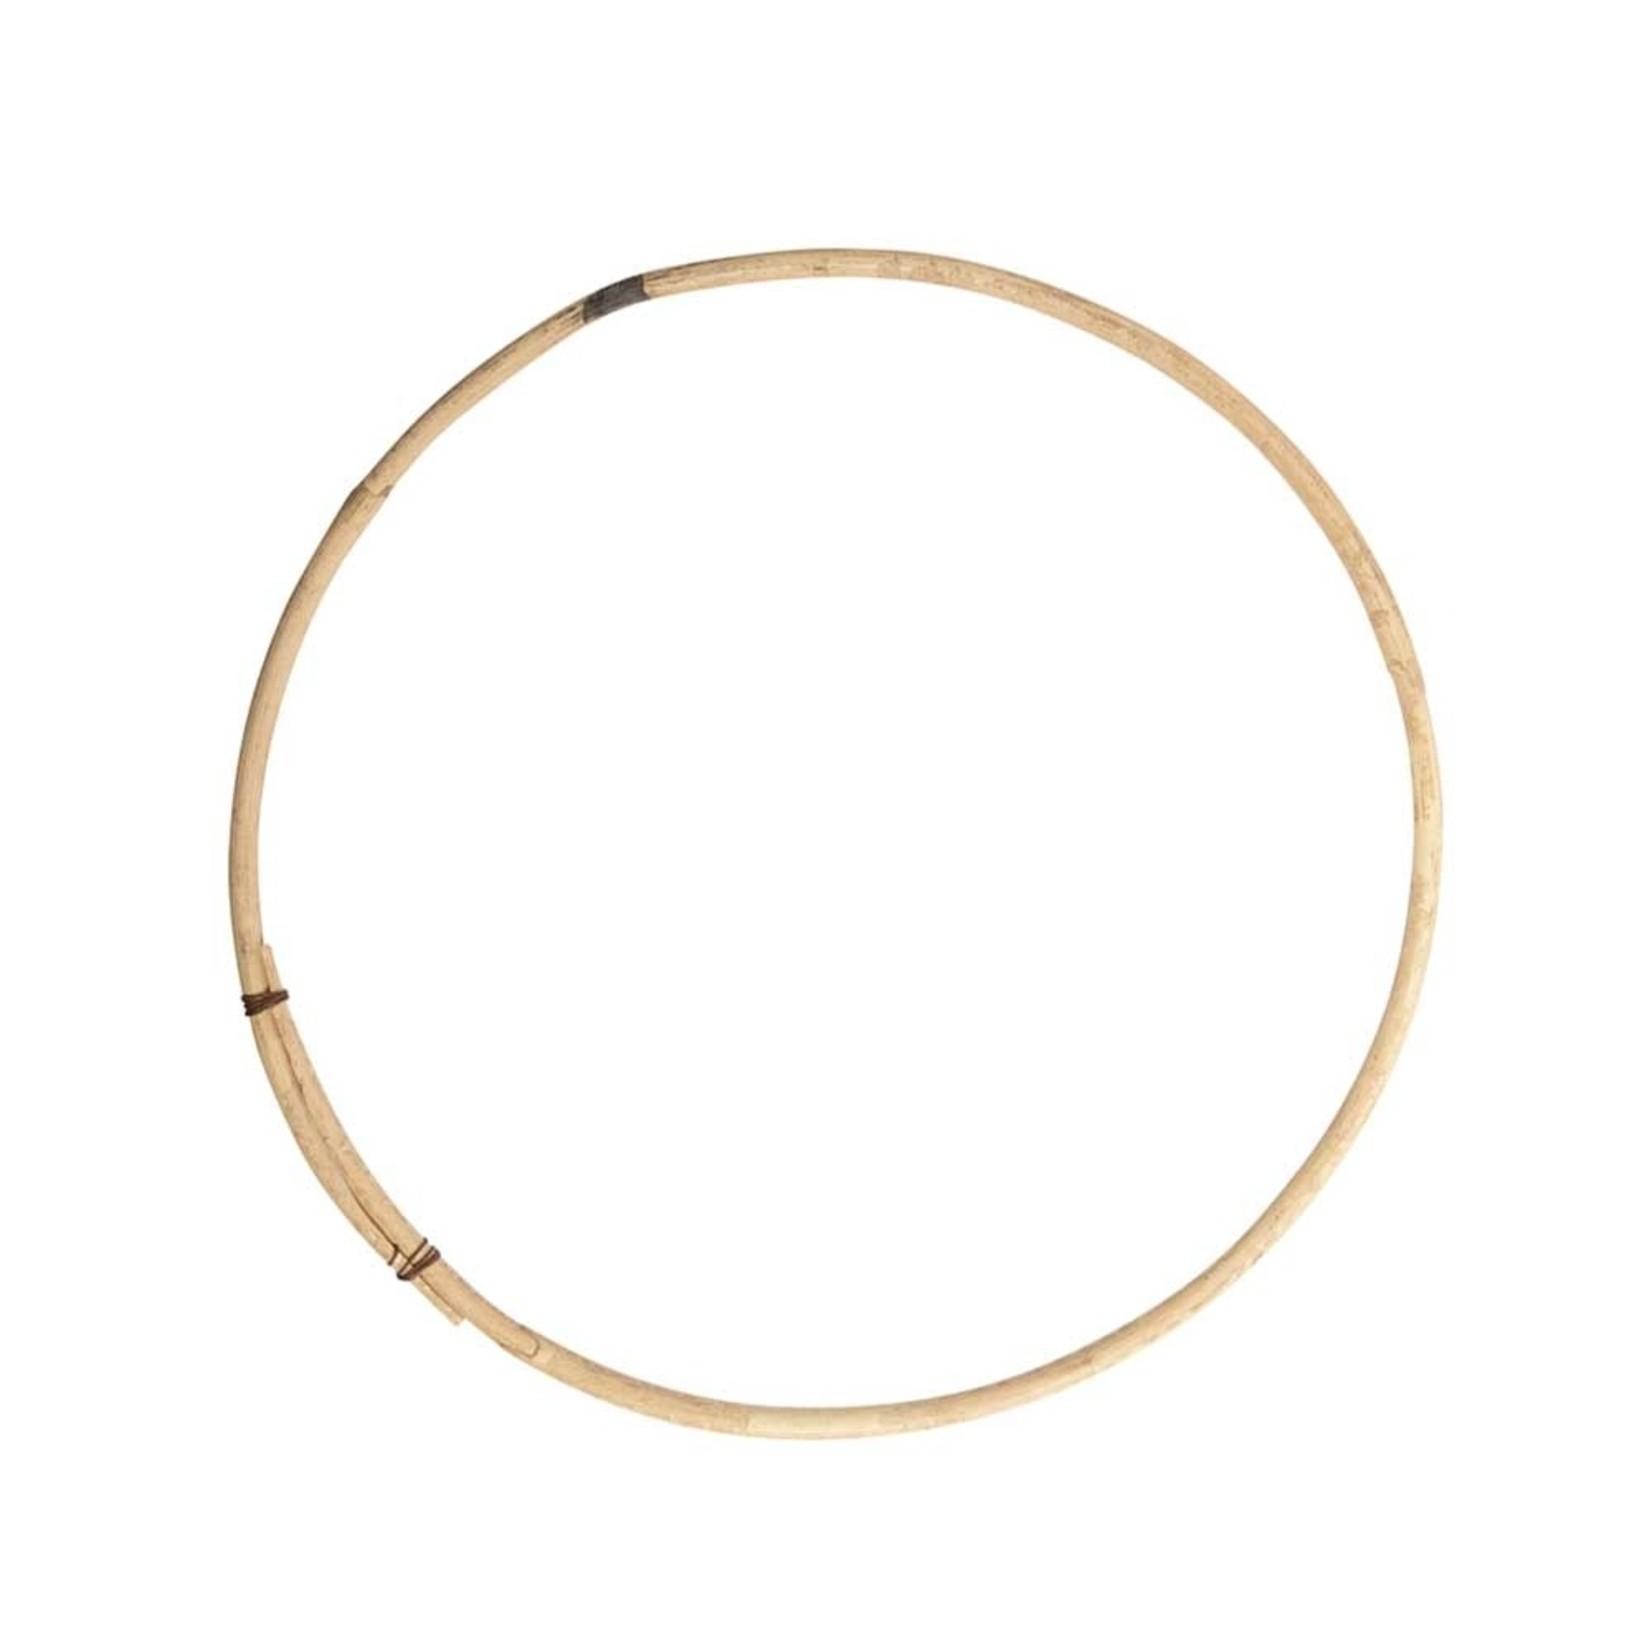 HBX Rattan Ring 45cm